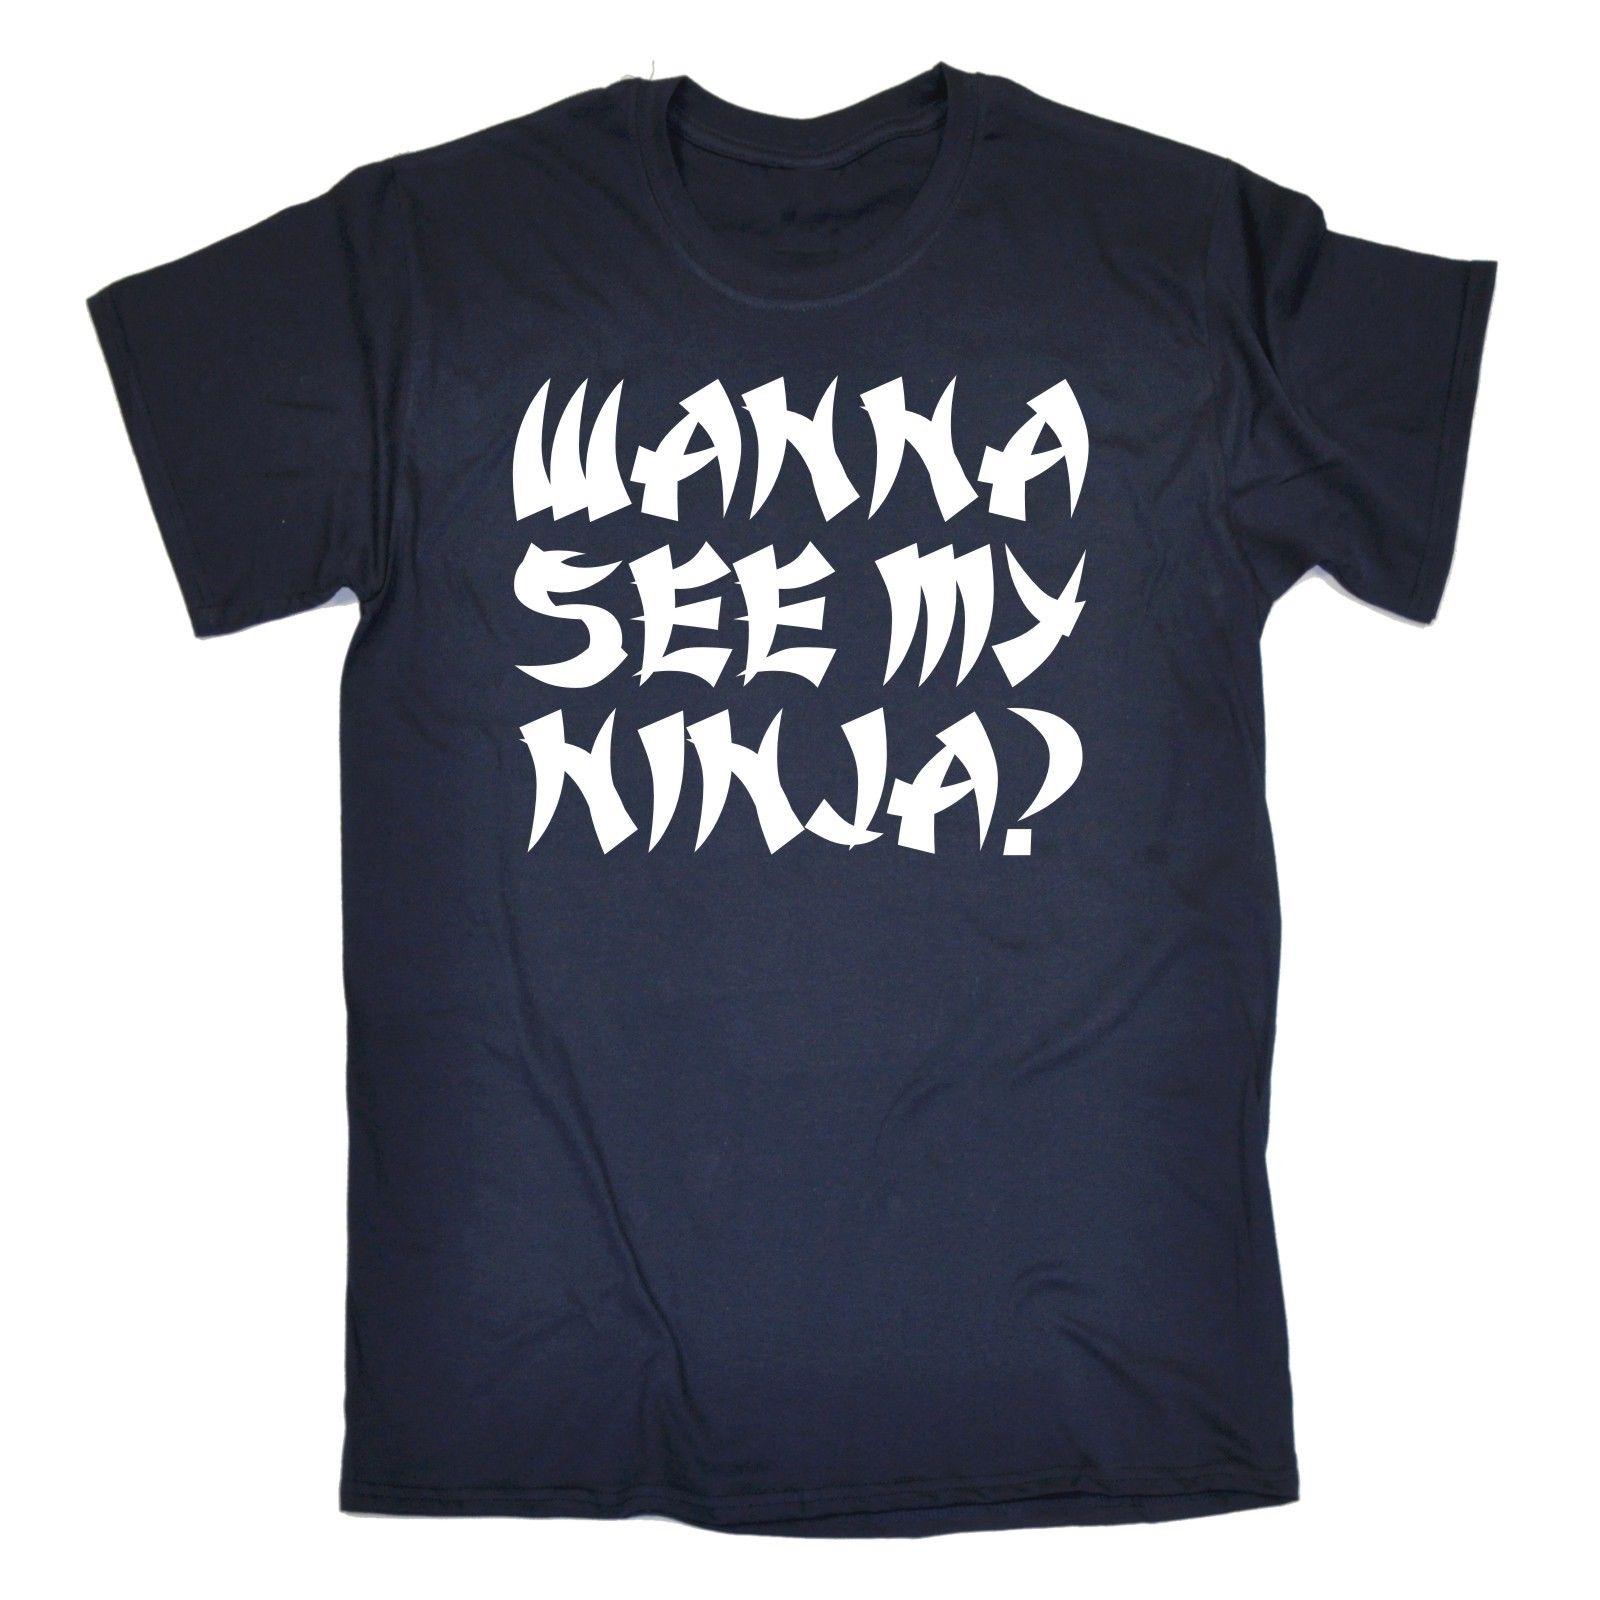 Wanna See My Ninja T-SHIRT Fancy Dress Humour Flip Warrior Funny Birthday Gift O-Neck Tops T Shirts MenS T-Shirt 2018 Newest